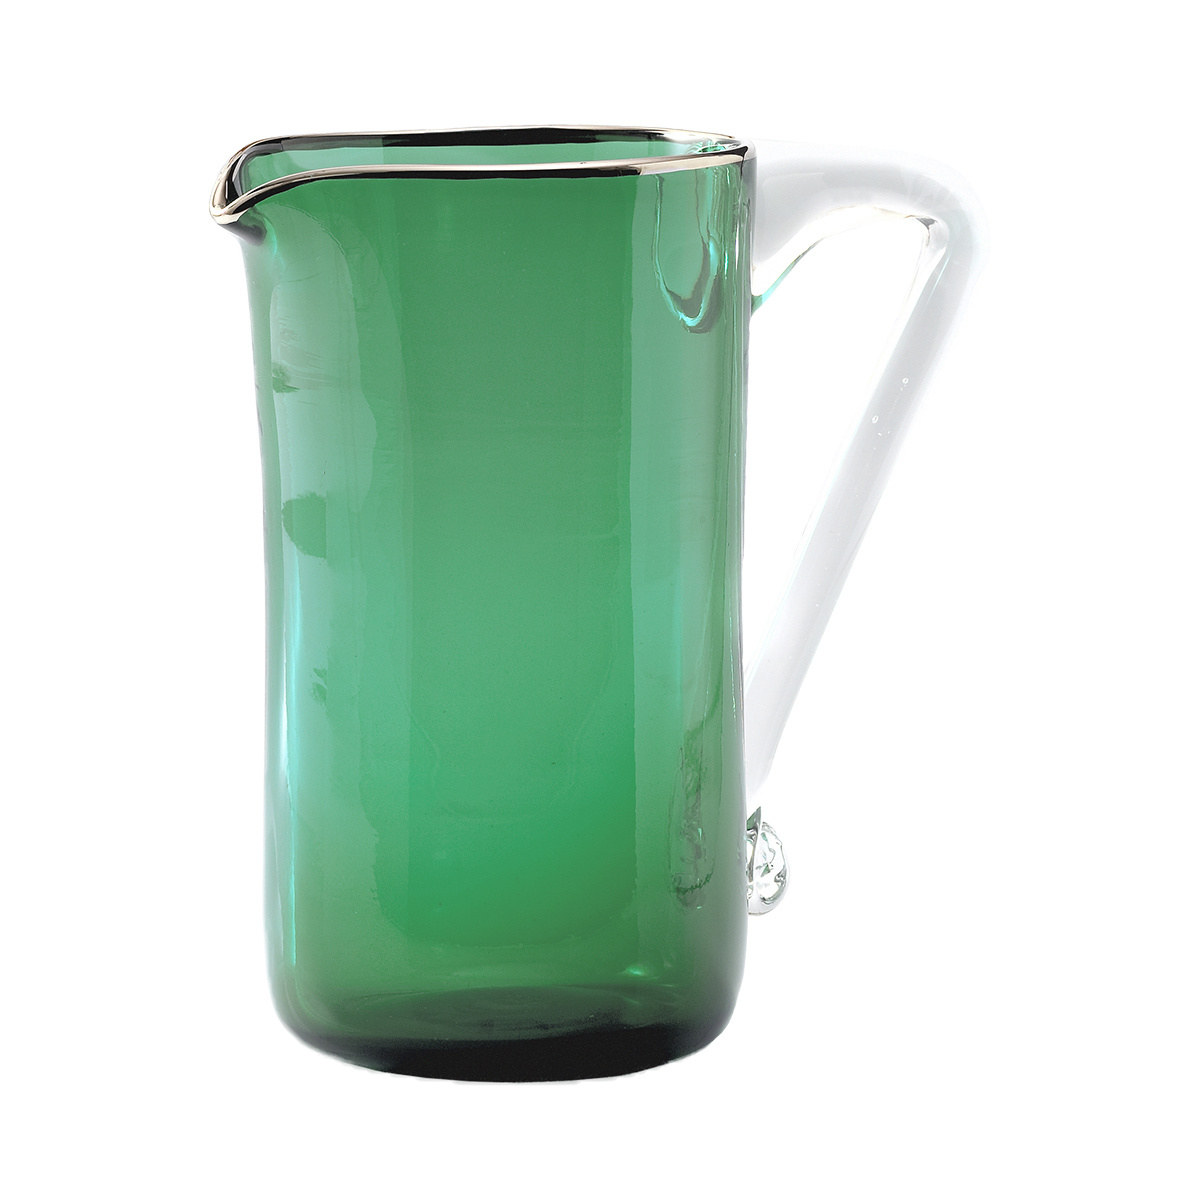 viola_jug_murano_glass_design_giberto_luxury_water_wine_drink_green_triangle_handle